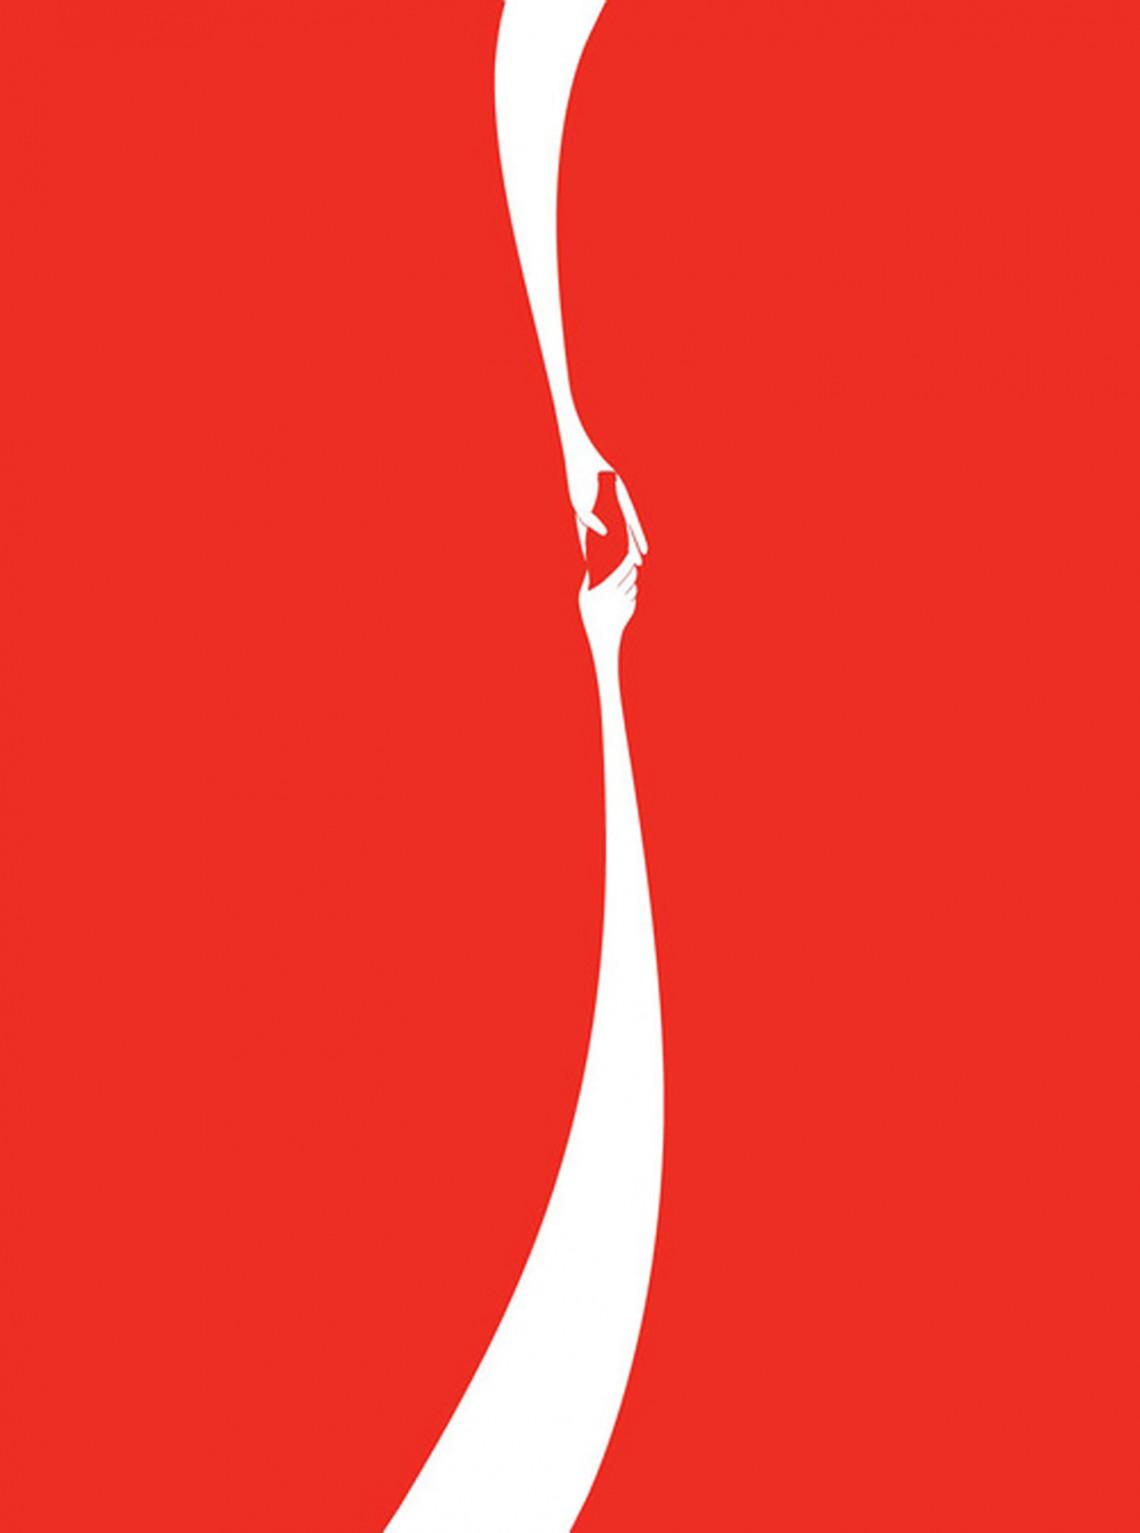 coca-cola16-hands1